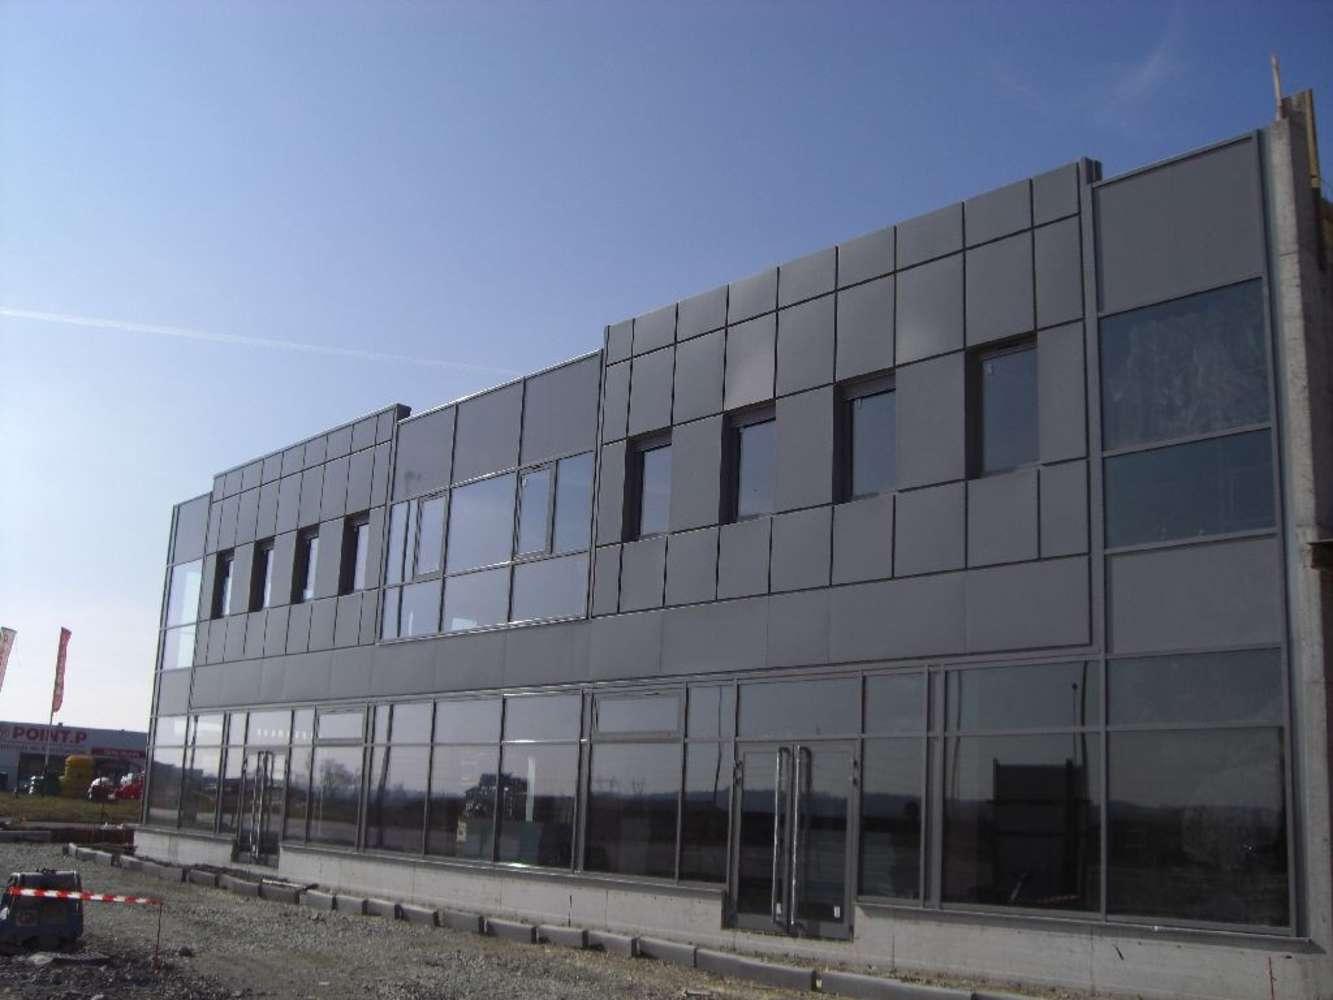 Activités/entrepôt Arnas, 69400 - Local d'activité à louer - Arnas (69) - 9873000